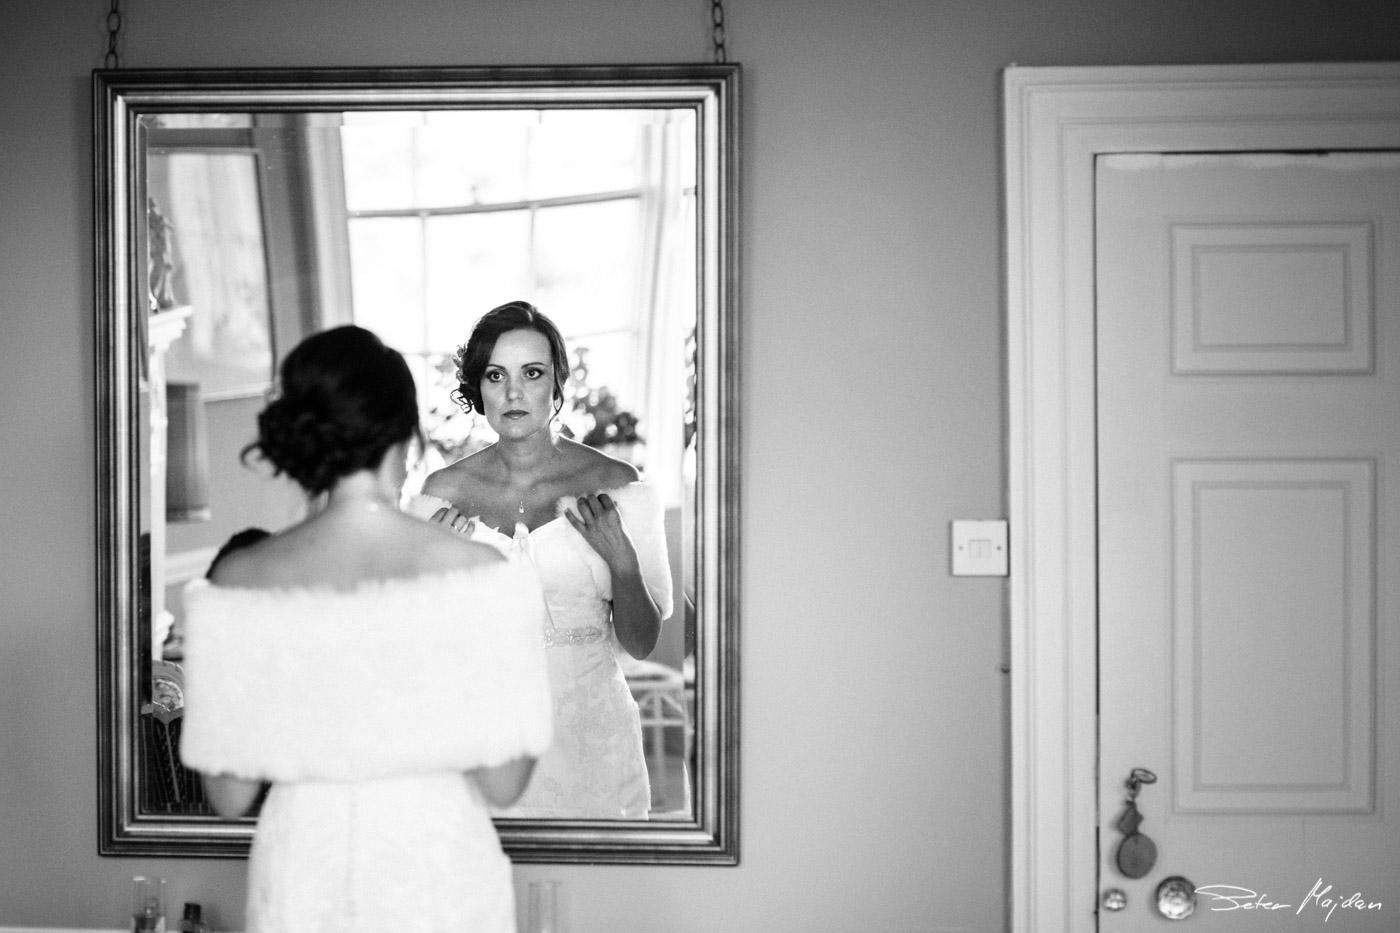 east-bridgford-hill-wedding-photography-20.jpg